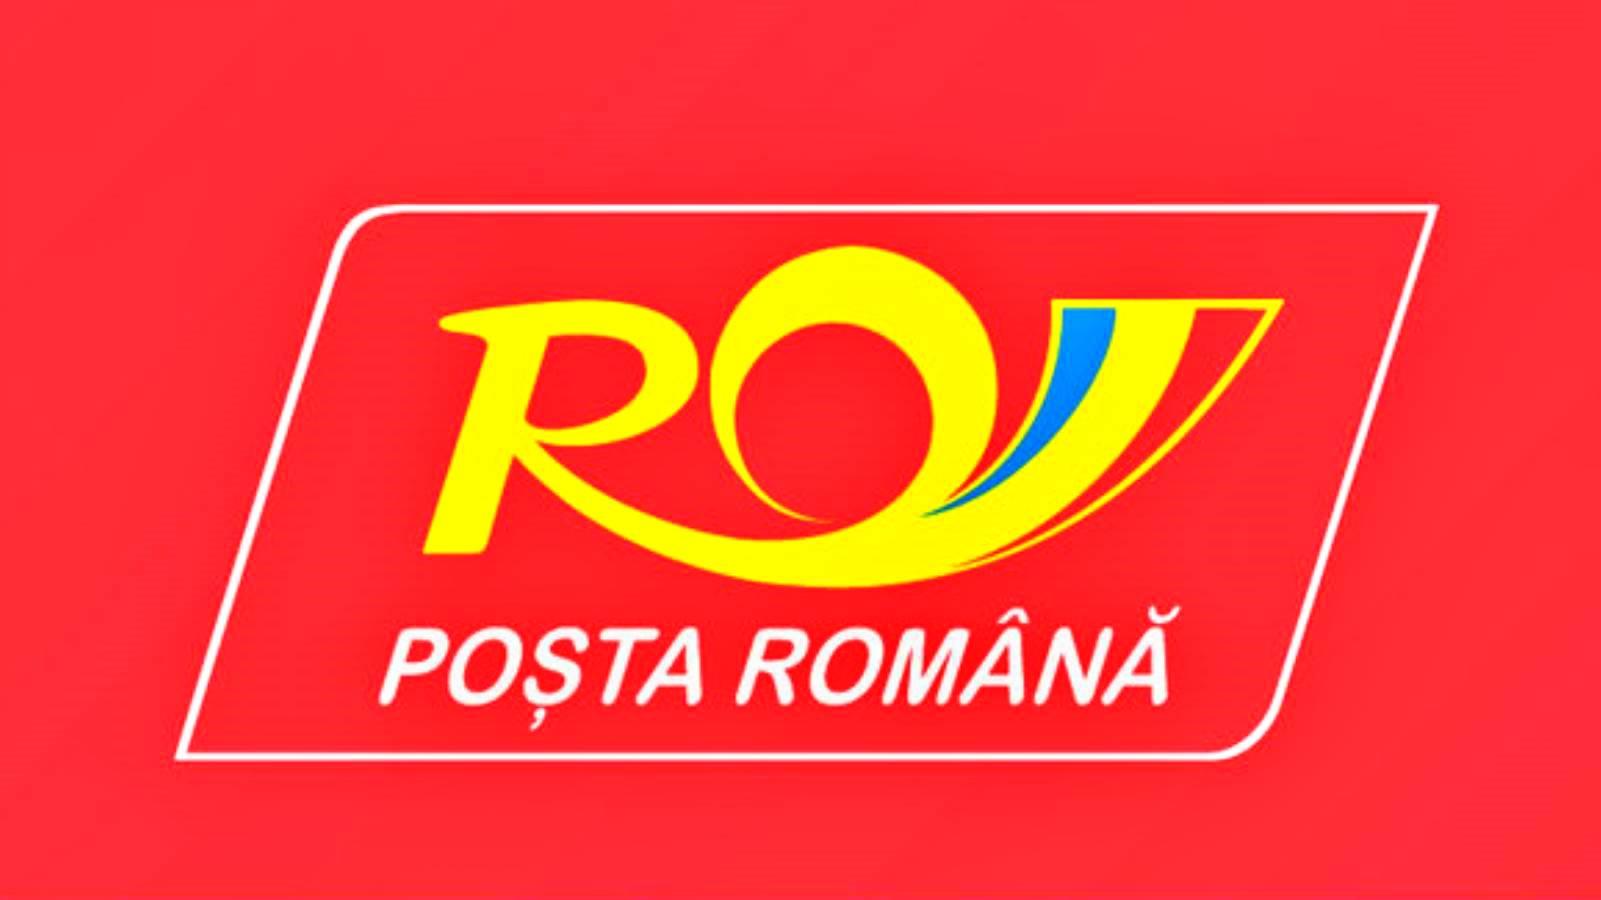 Posta Romana Cum poti Cumpara Rovinieta pentru Calatorii